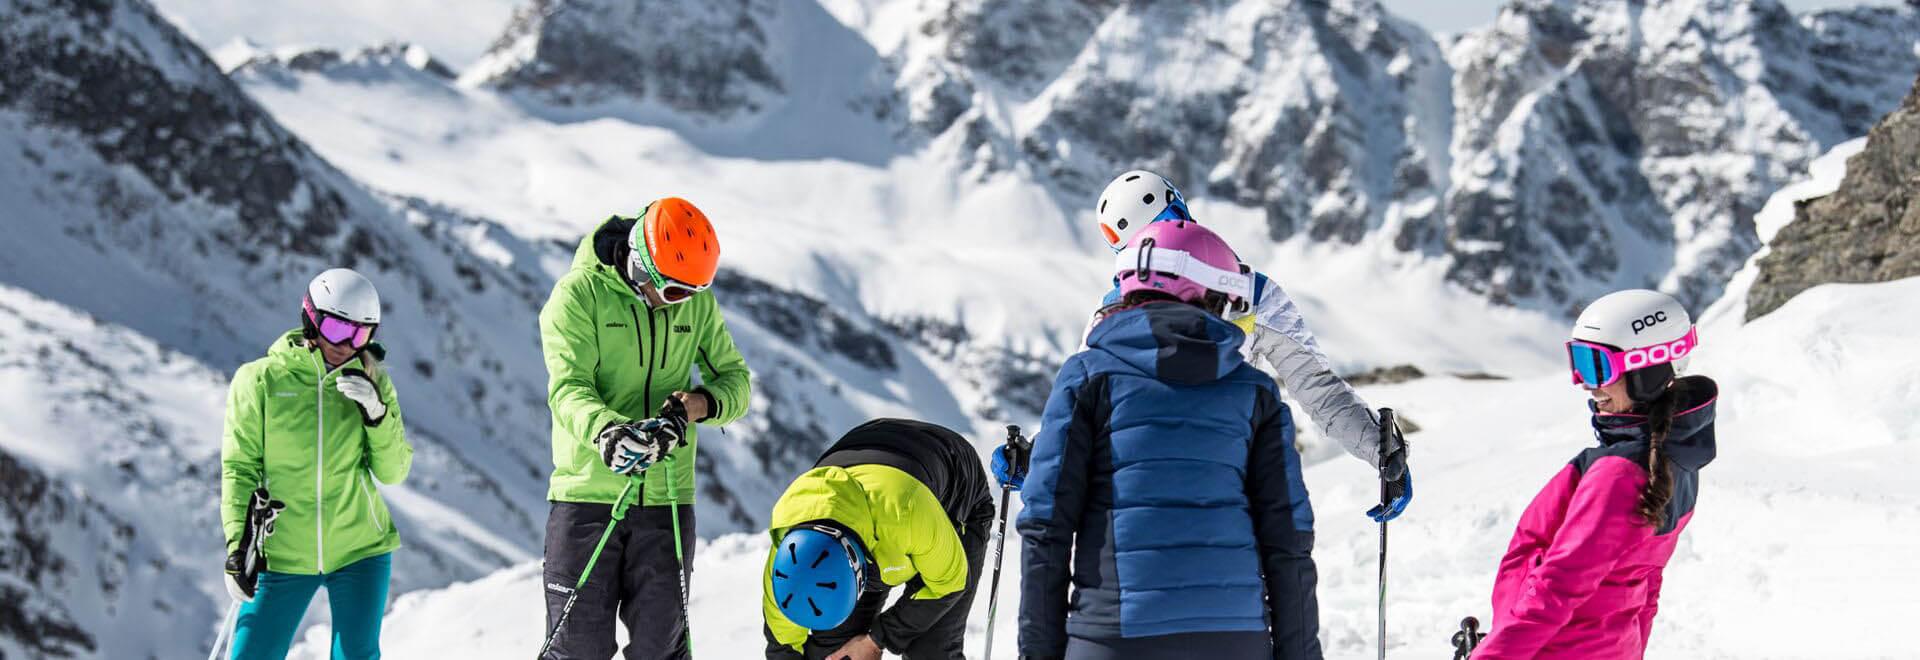 ski rental saalbach